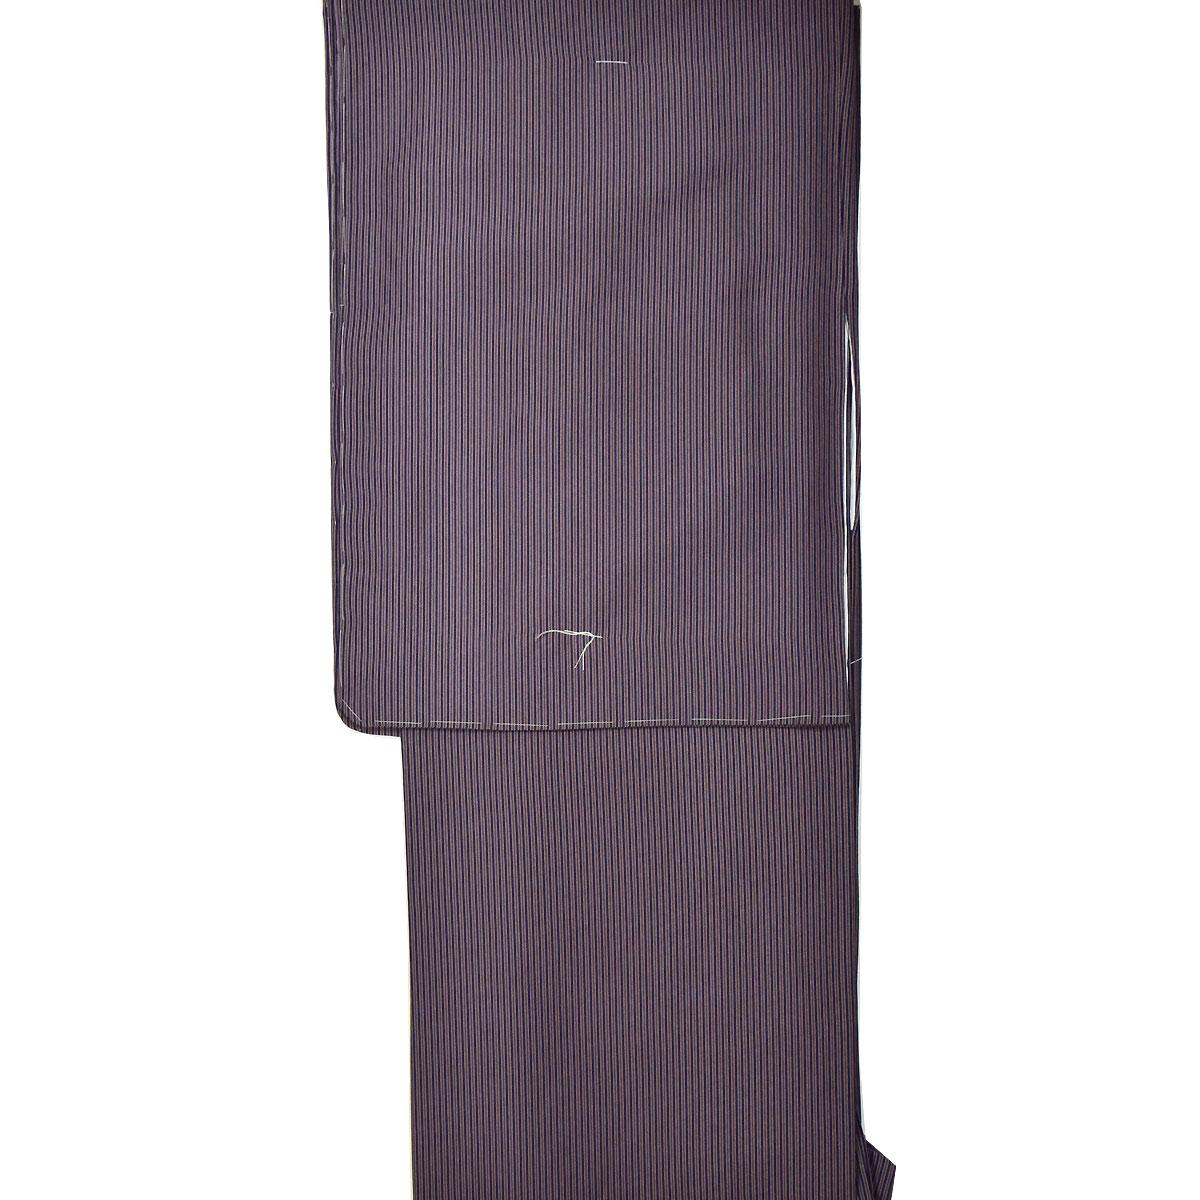 【M寸】 洗える着物 【 袷 】【 江戸小紋 】 【 仕立て上がり 】 洗える 着物 単品商品番号d914-60